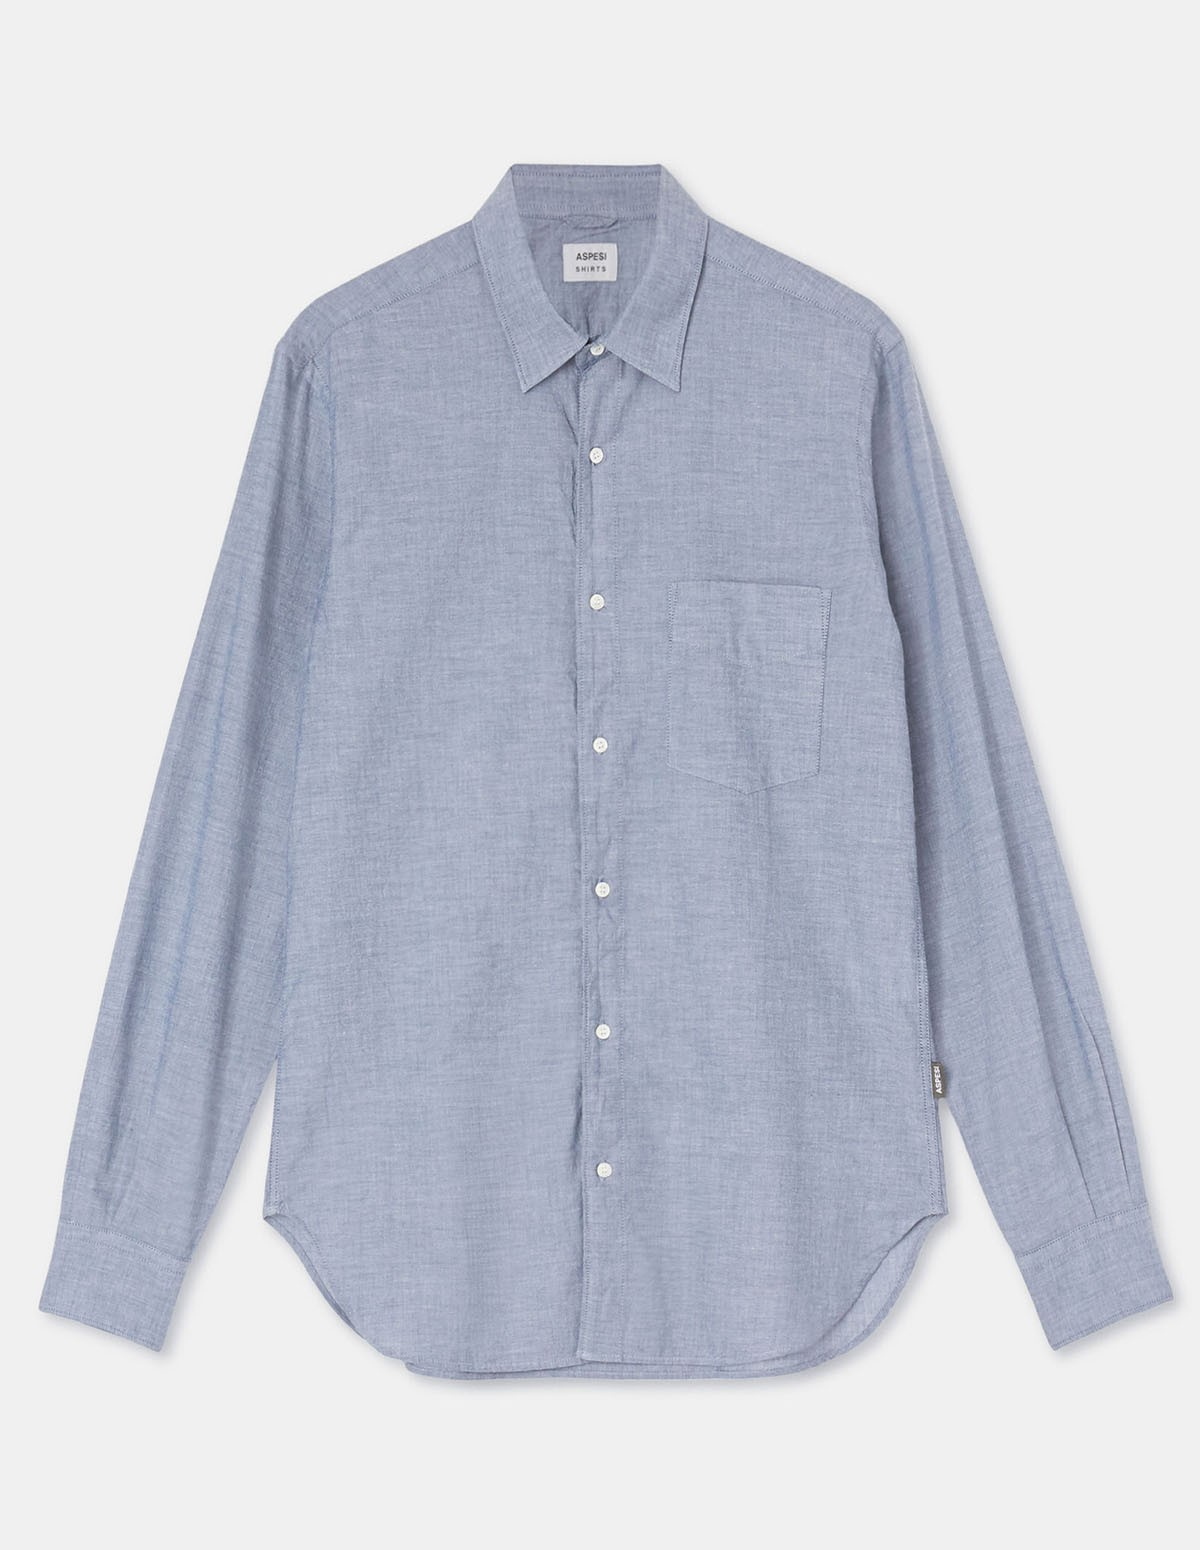 Aspesi Ridotta Ii Shirt